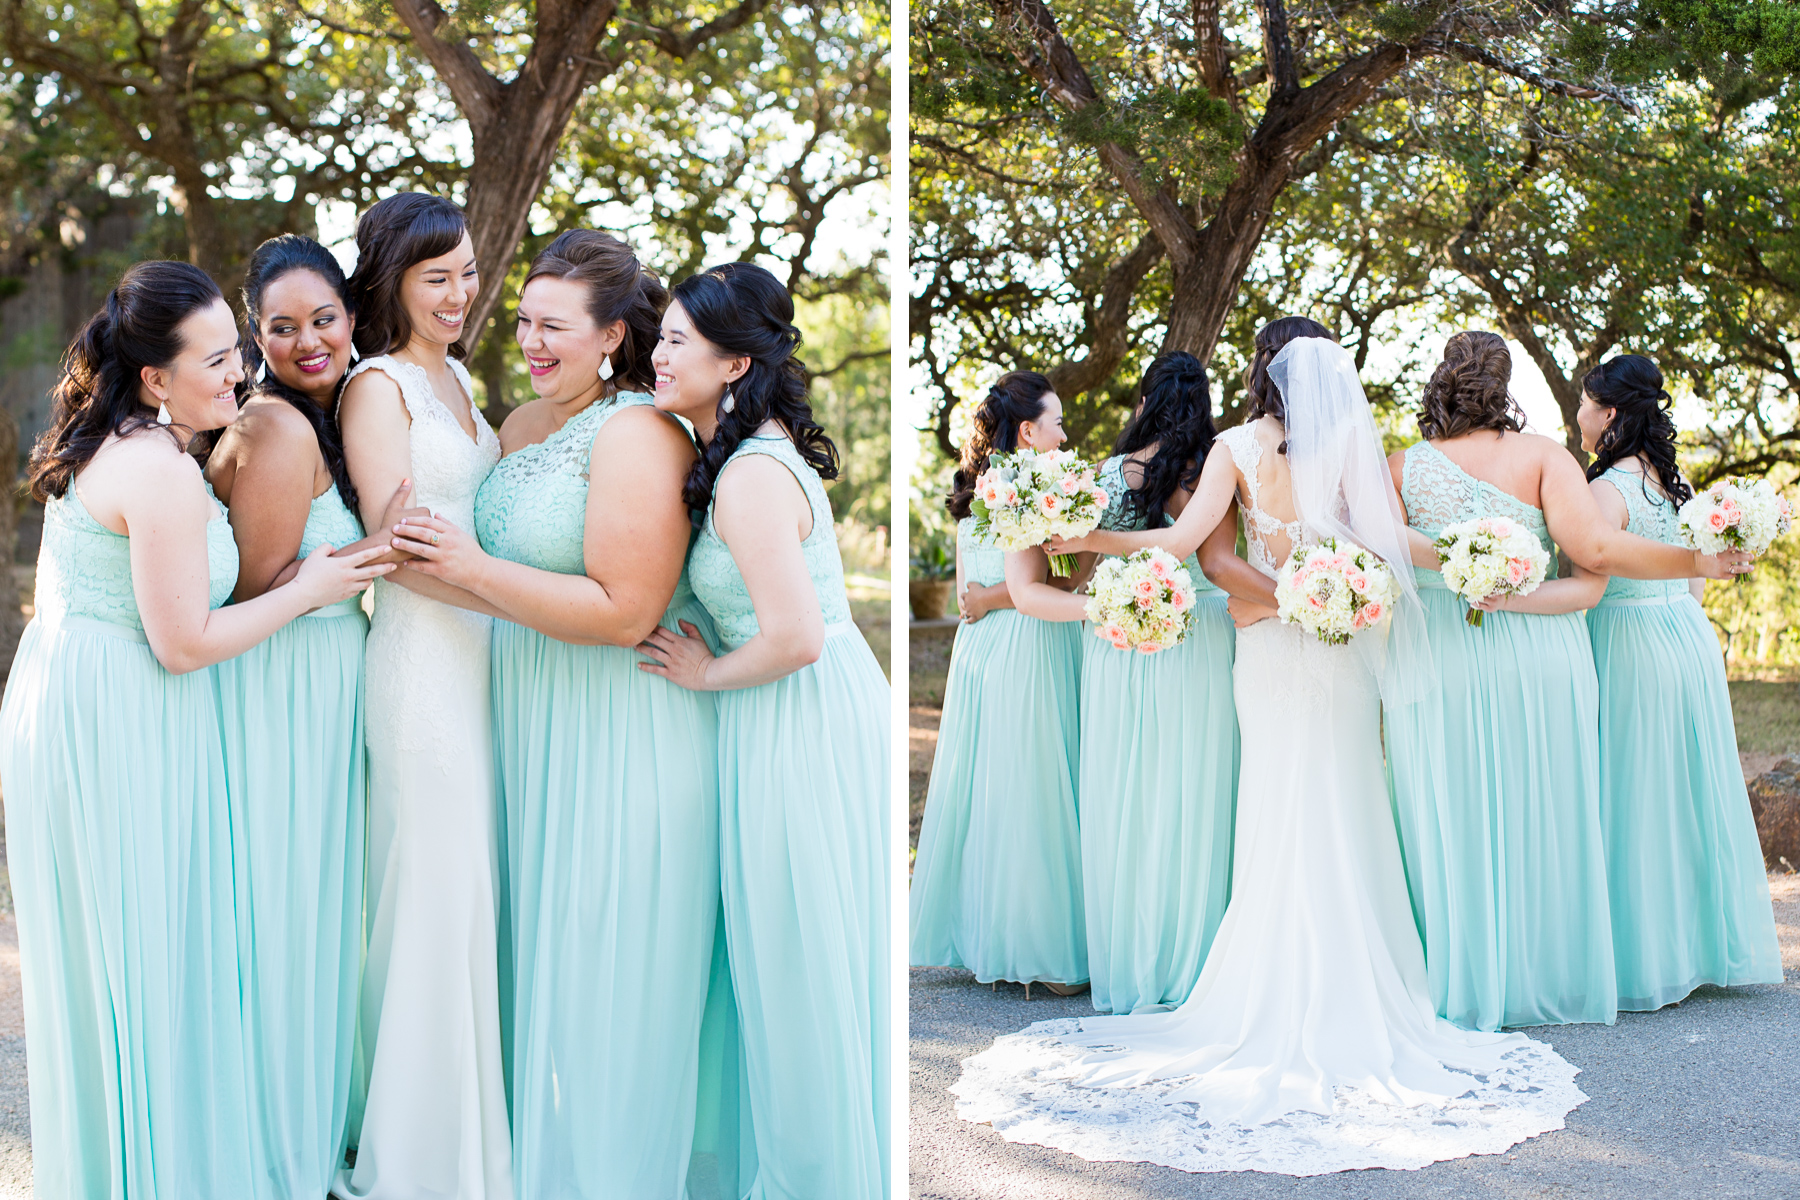 bridal-party-photographs-terrace-club.jpg